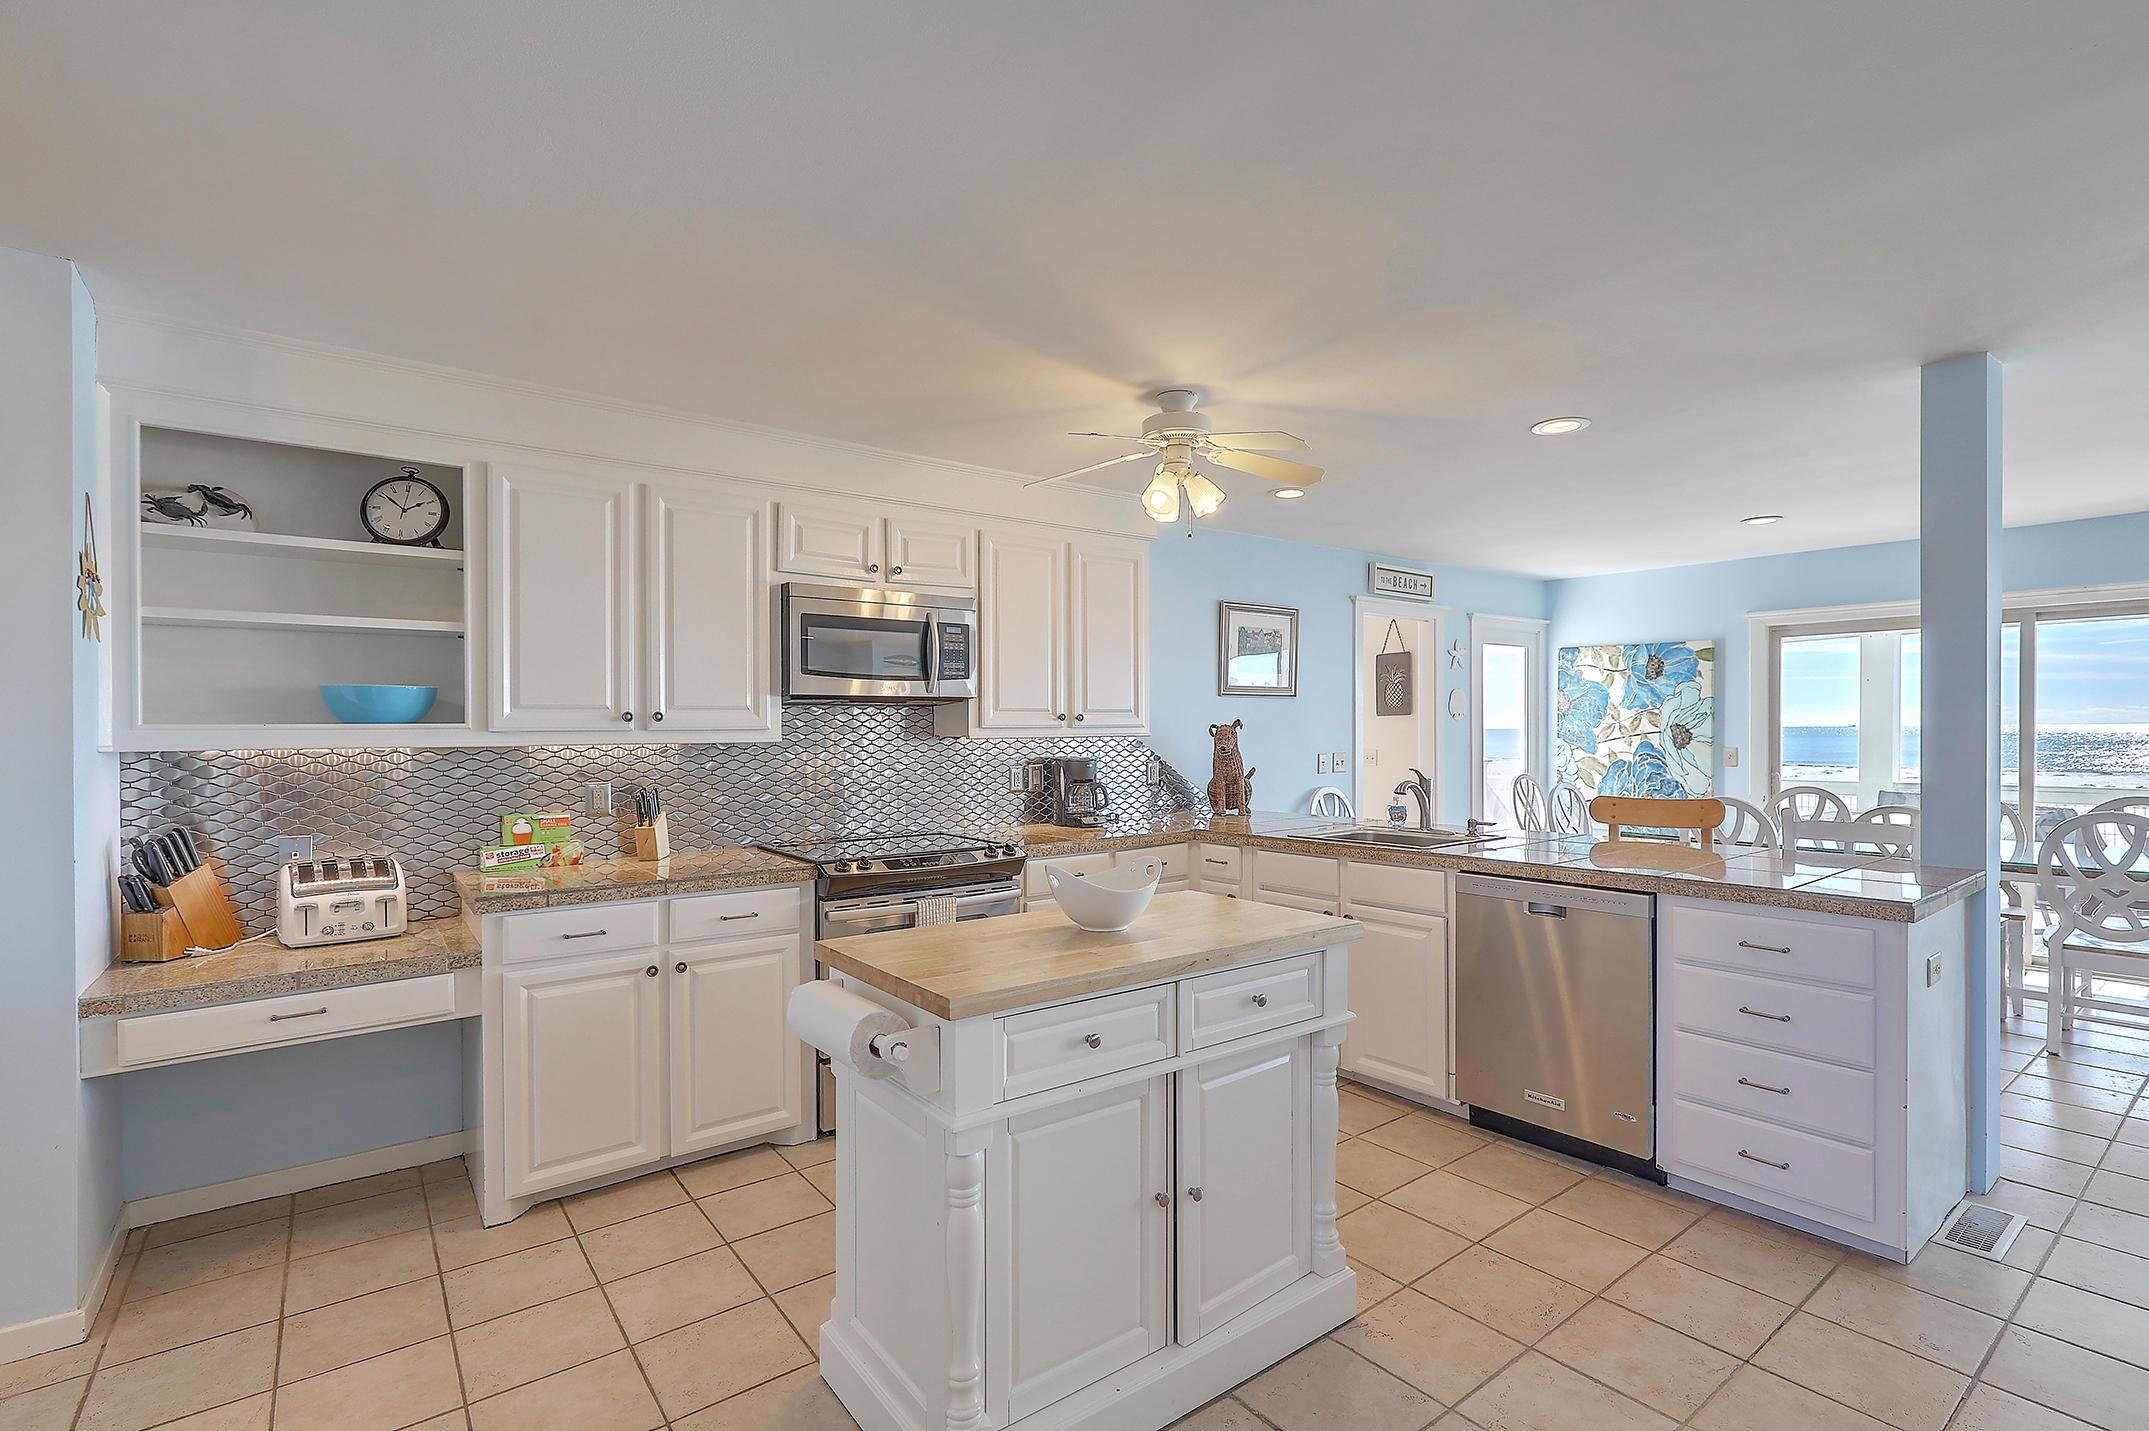 Wild Dunes Homes For Sale - 14 Beachwood East, Isle of Palms, SC - 7